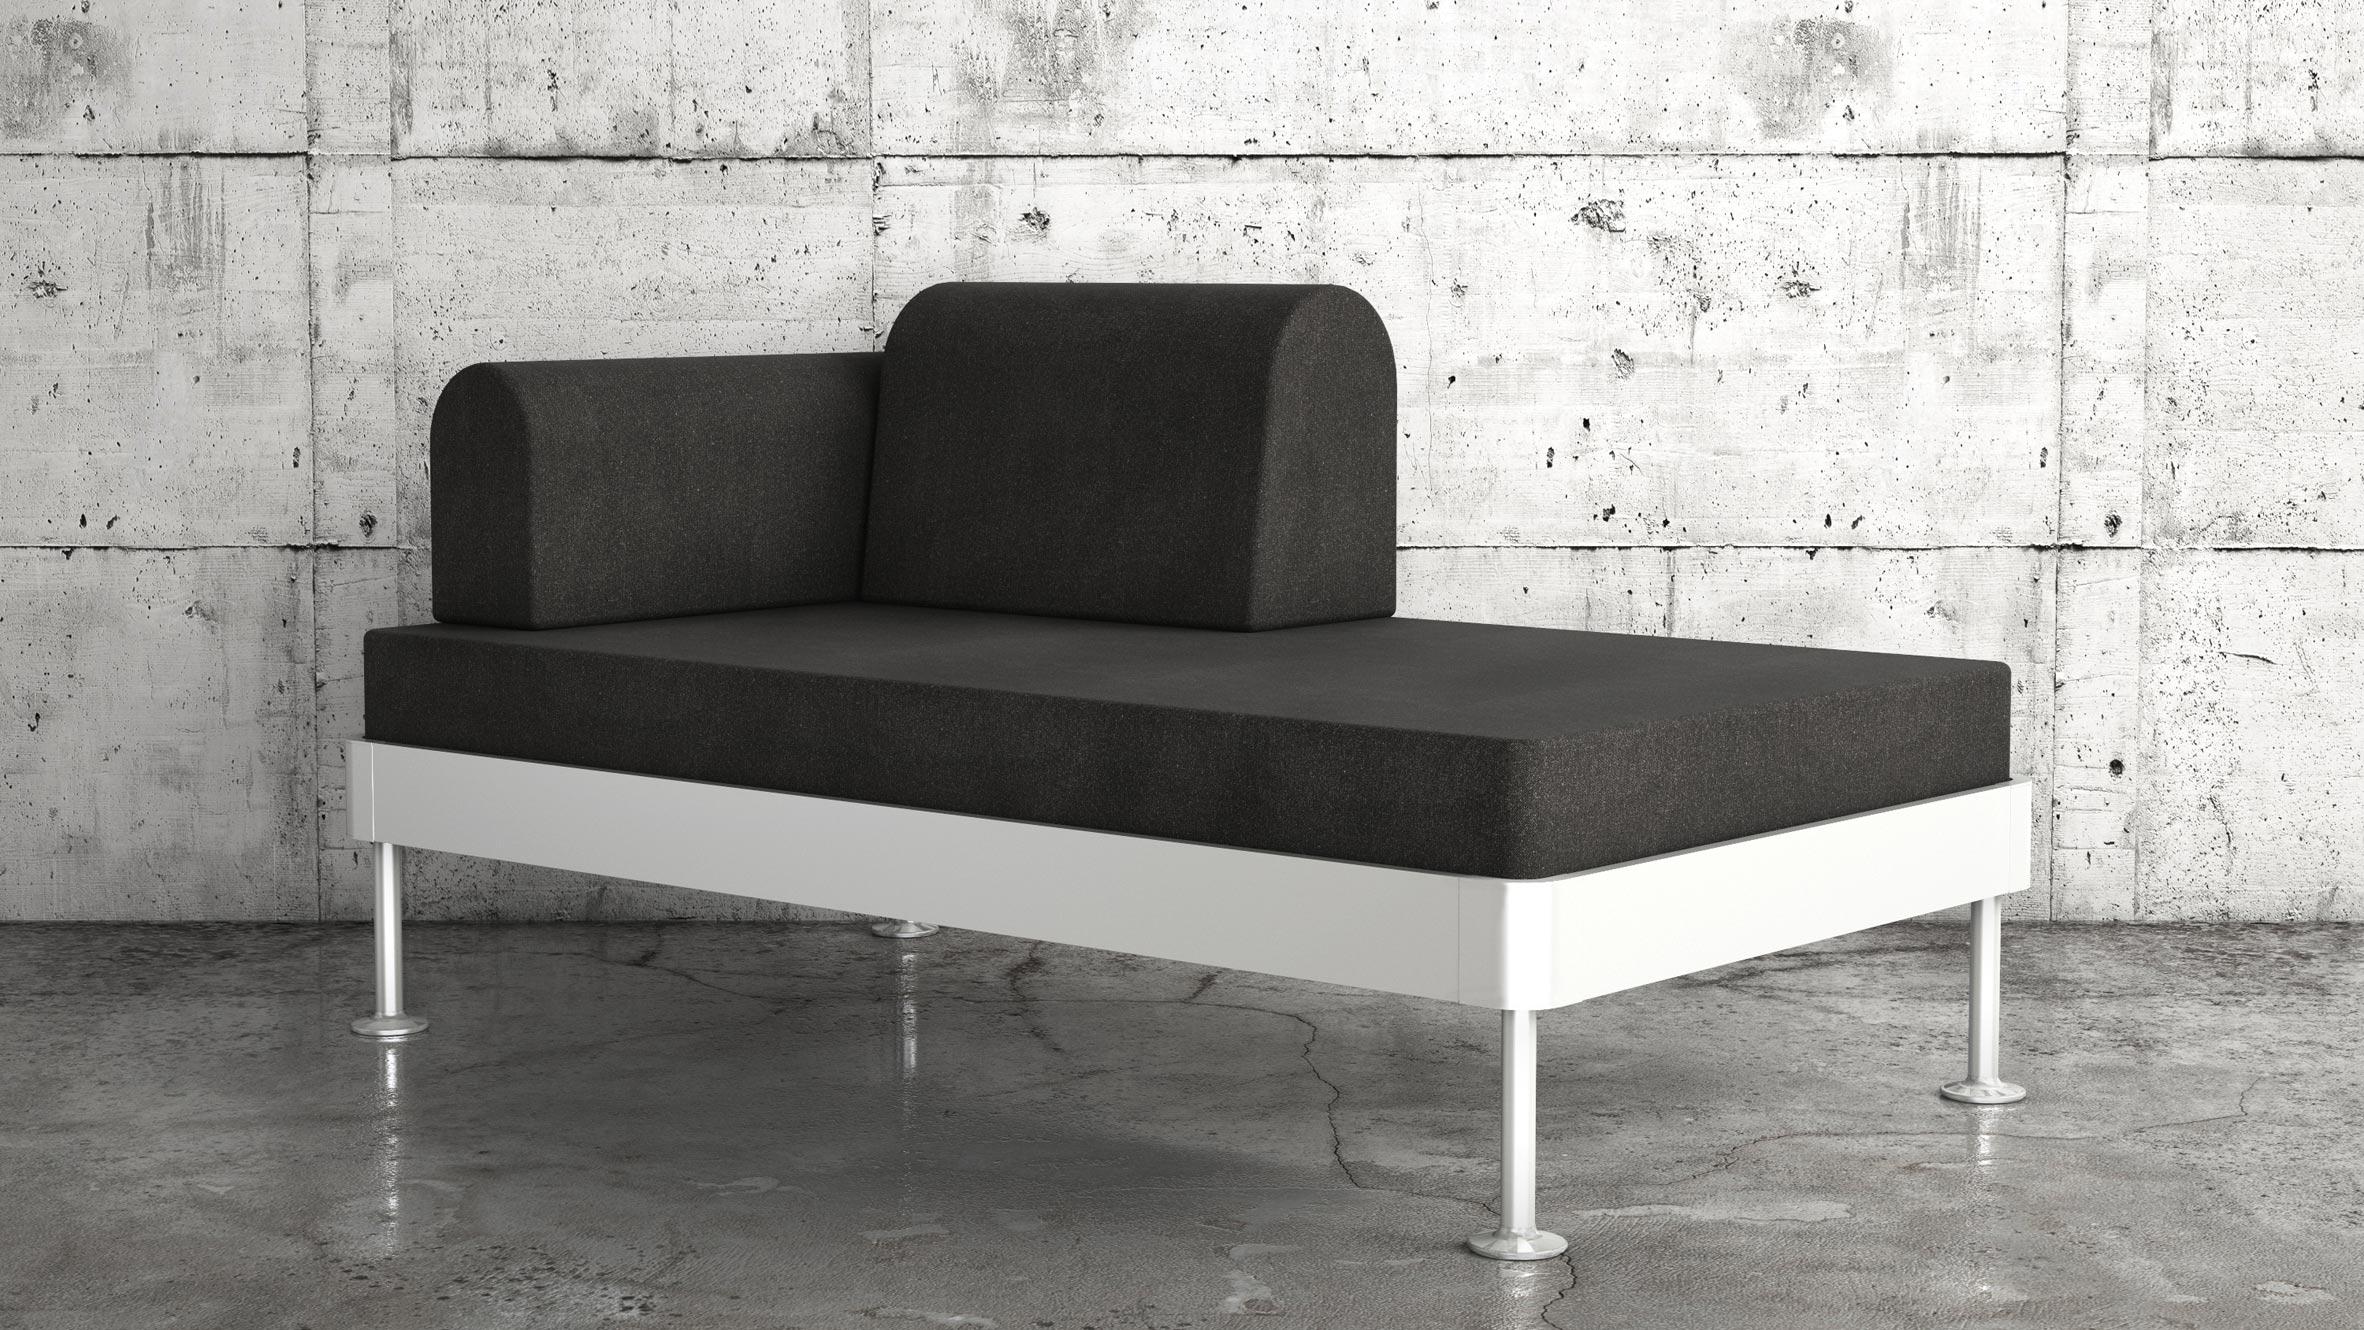 Modular Bedroom Furniture Systems Ikea Reveals Tom Dixons Delaktig Modular Bed And Sofa